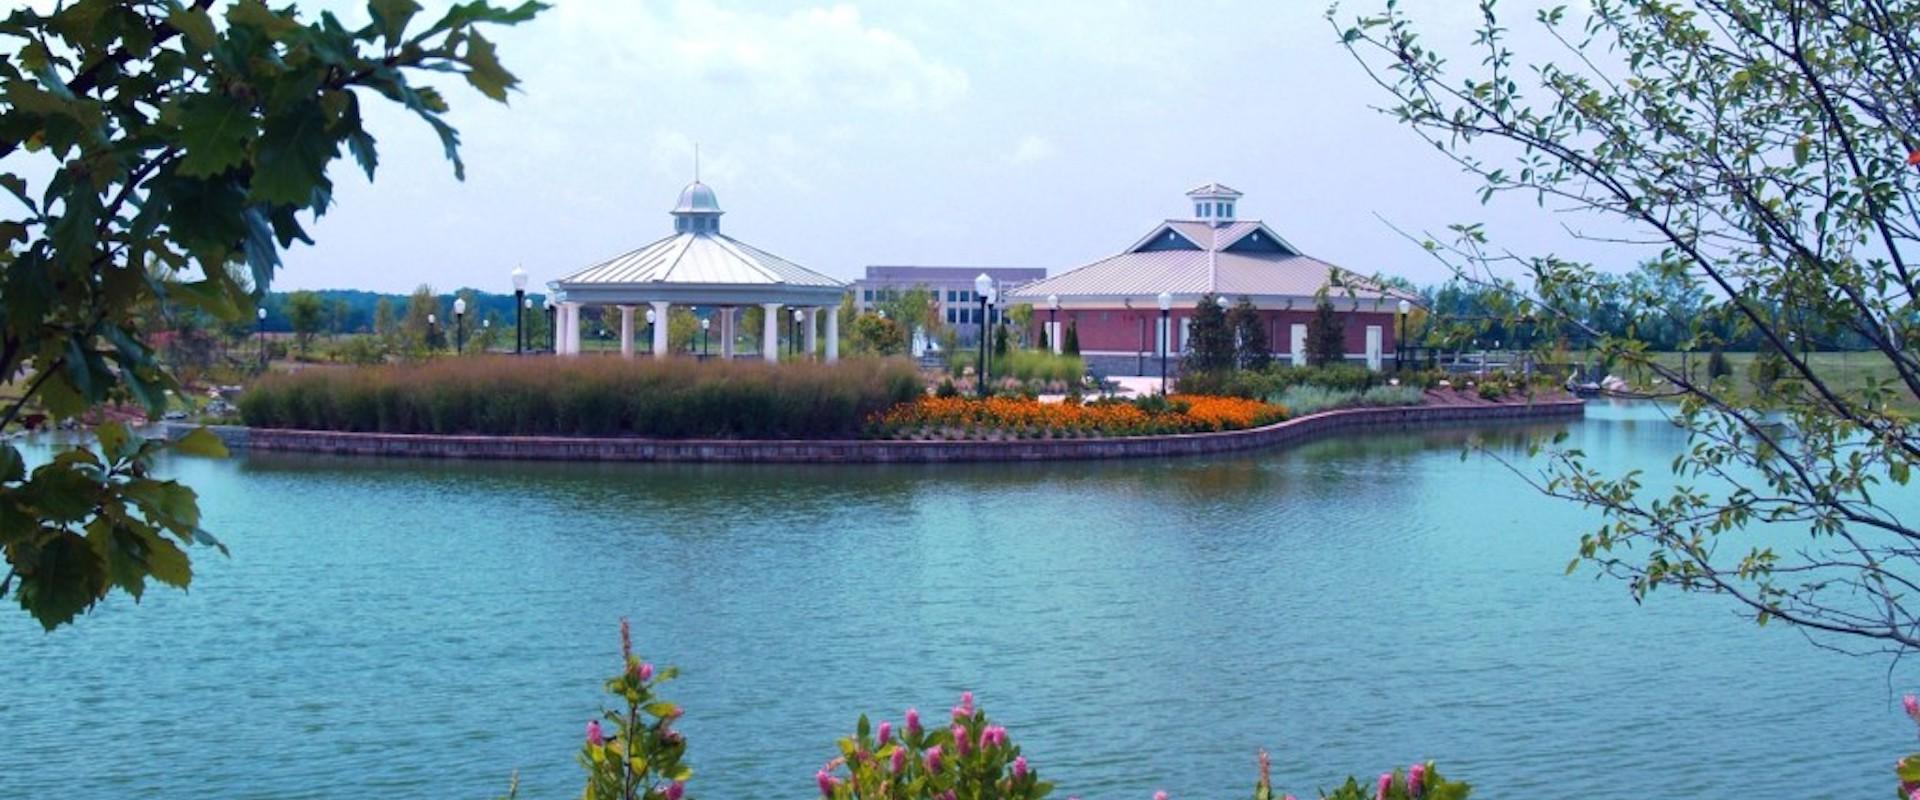 Gateway Island Park 2